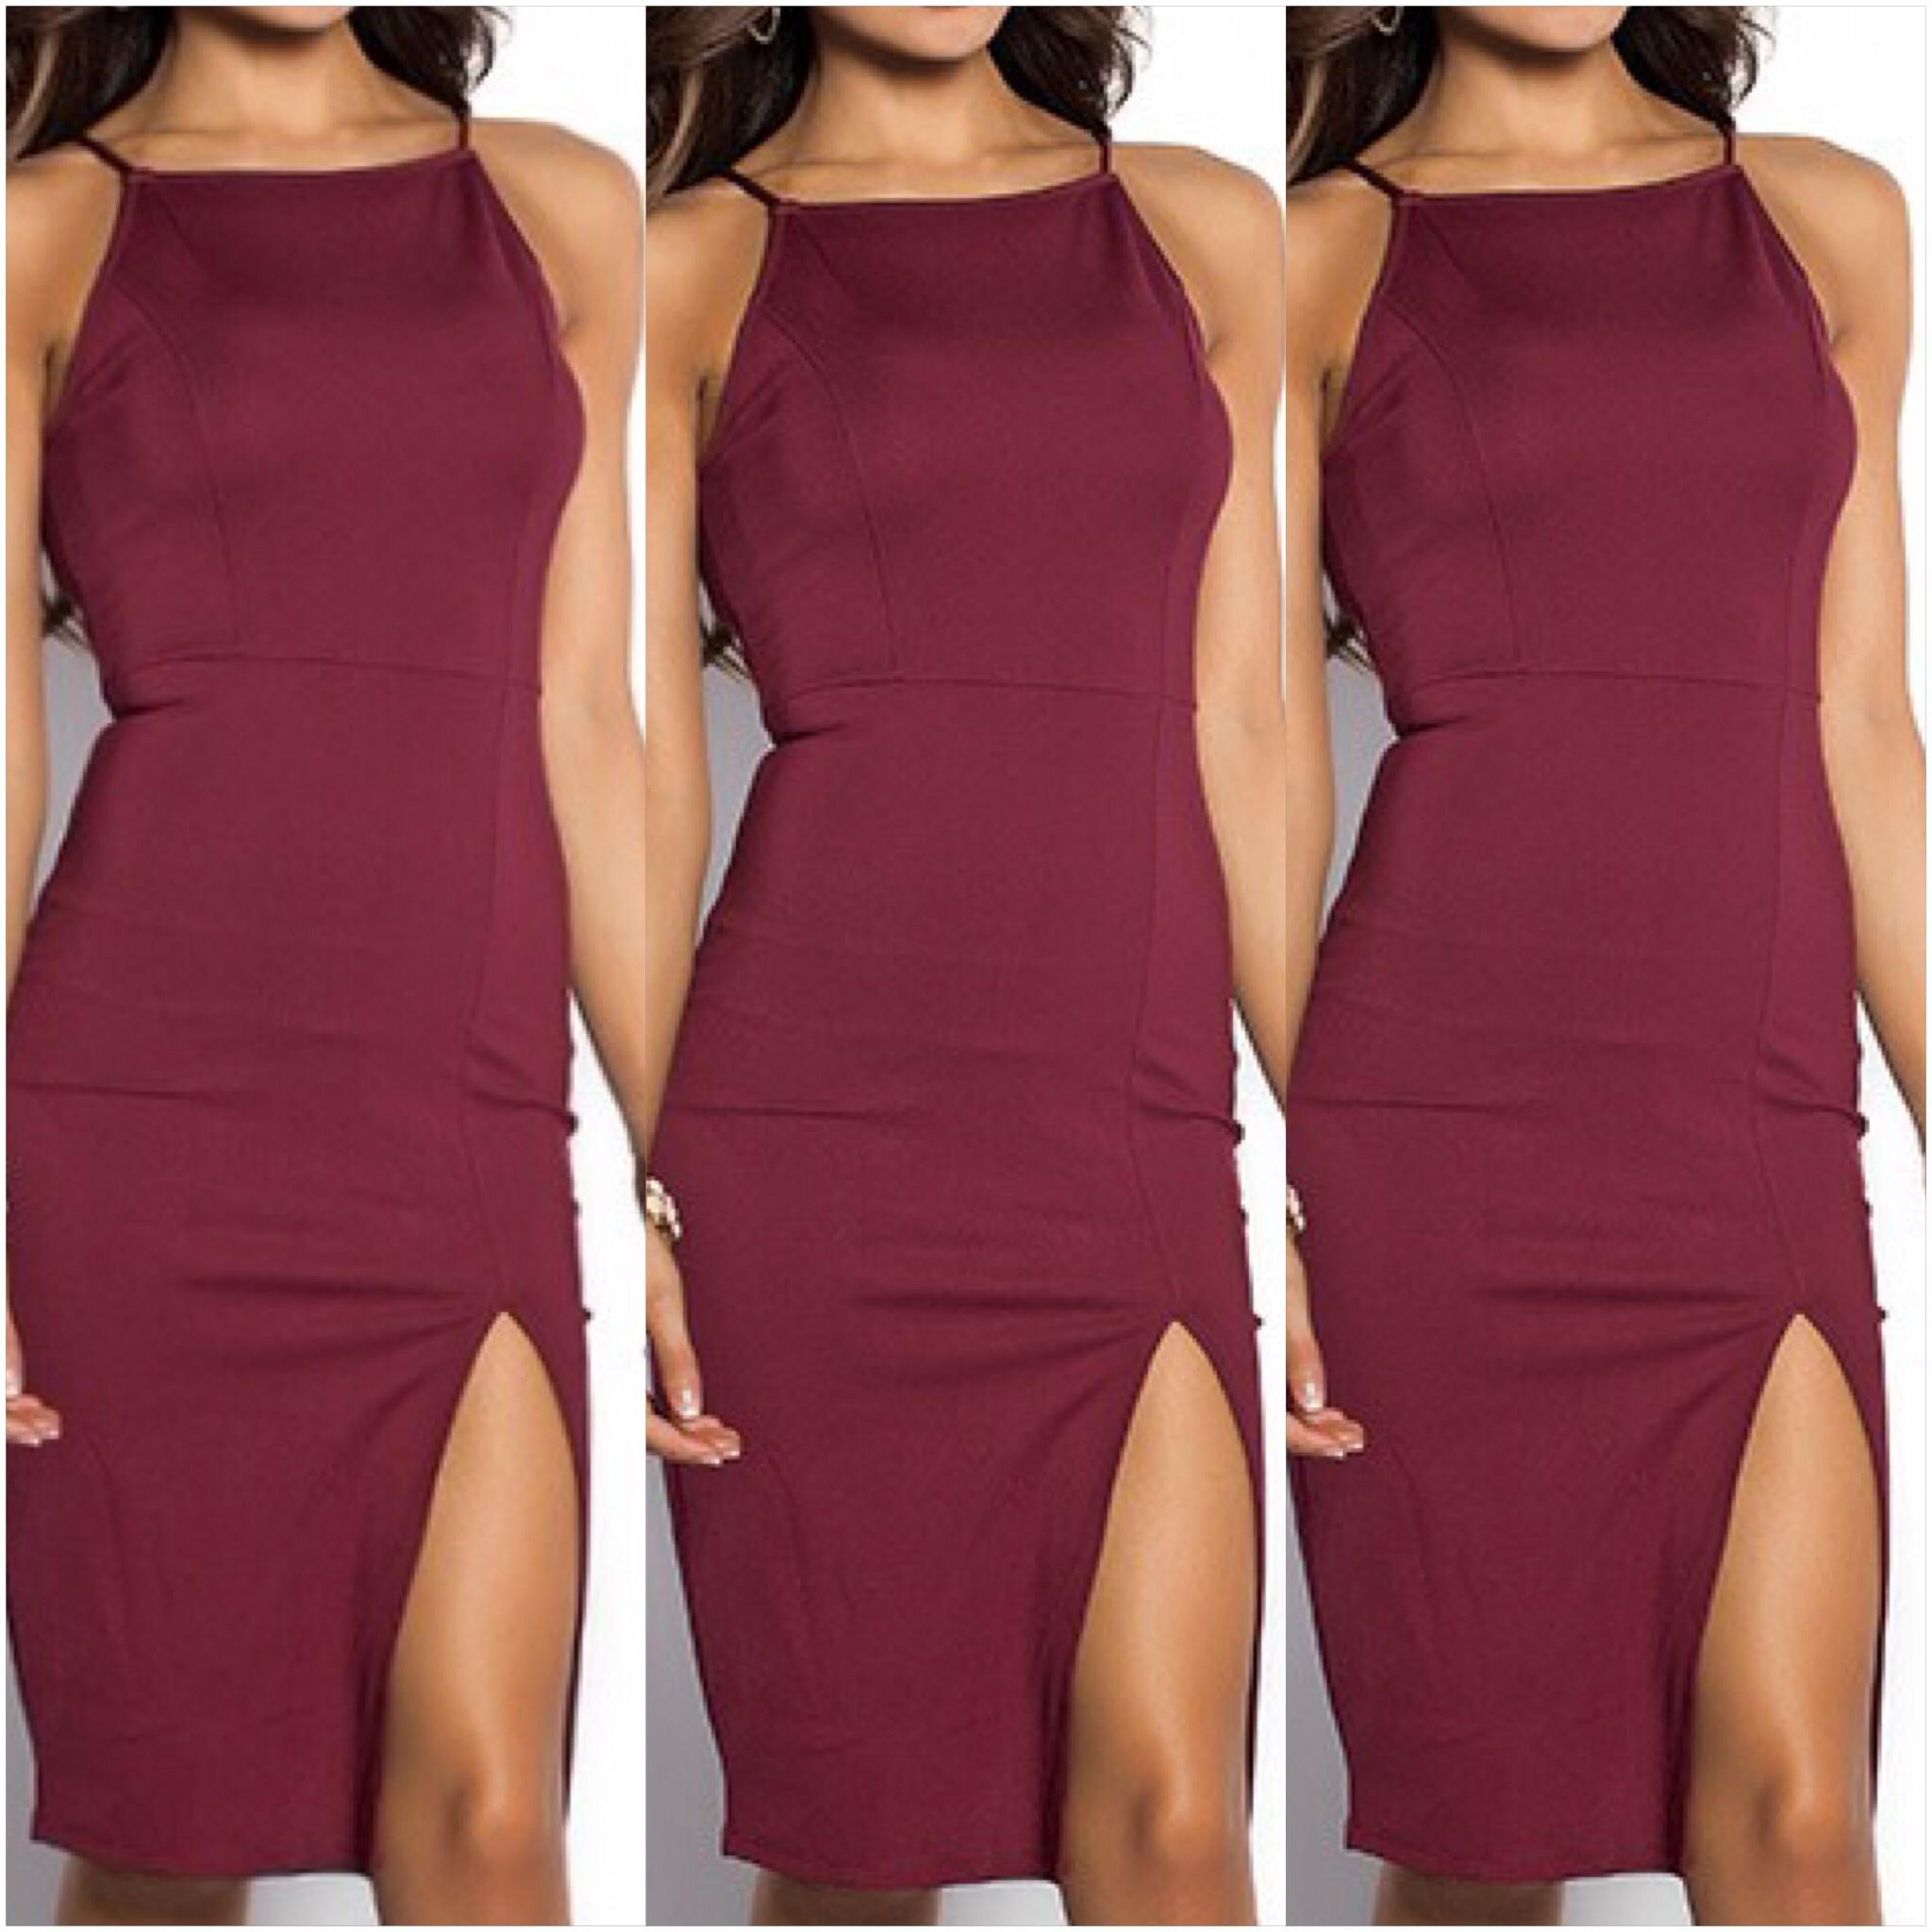 Marsala Cocktail Slit Dress